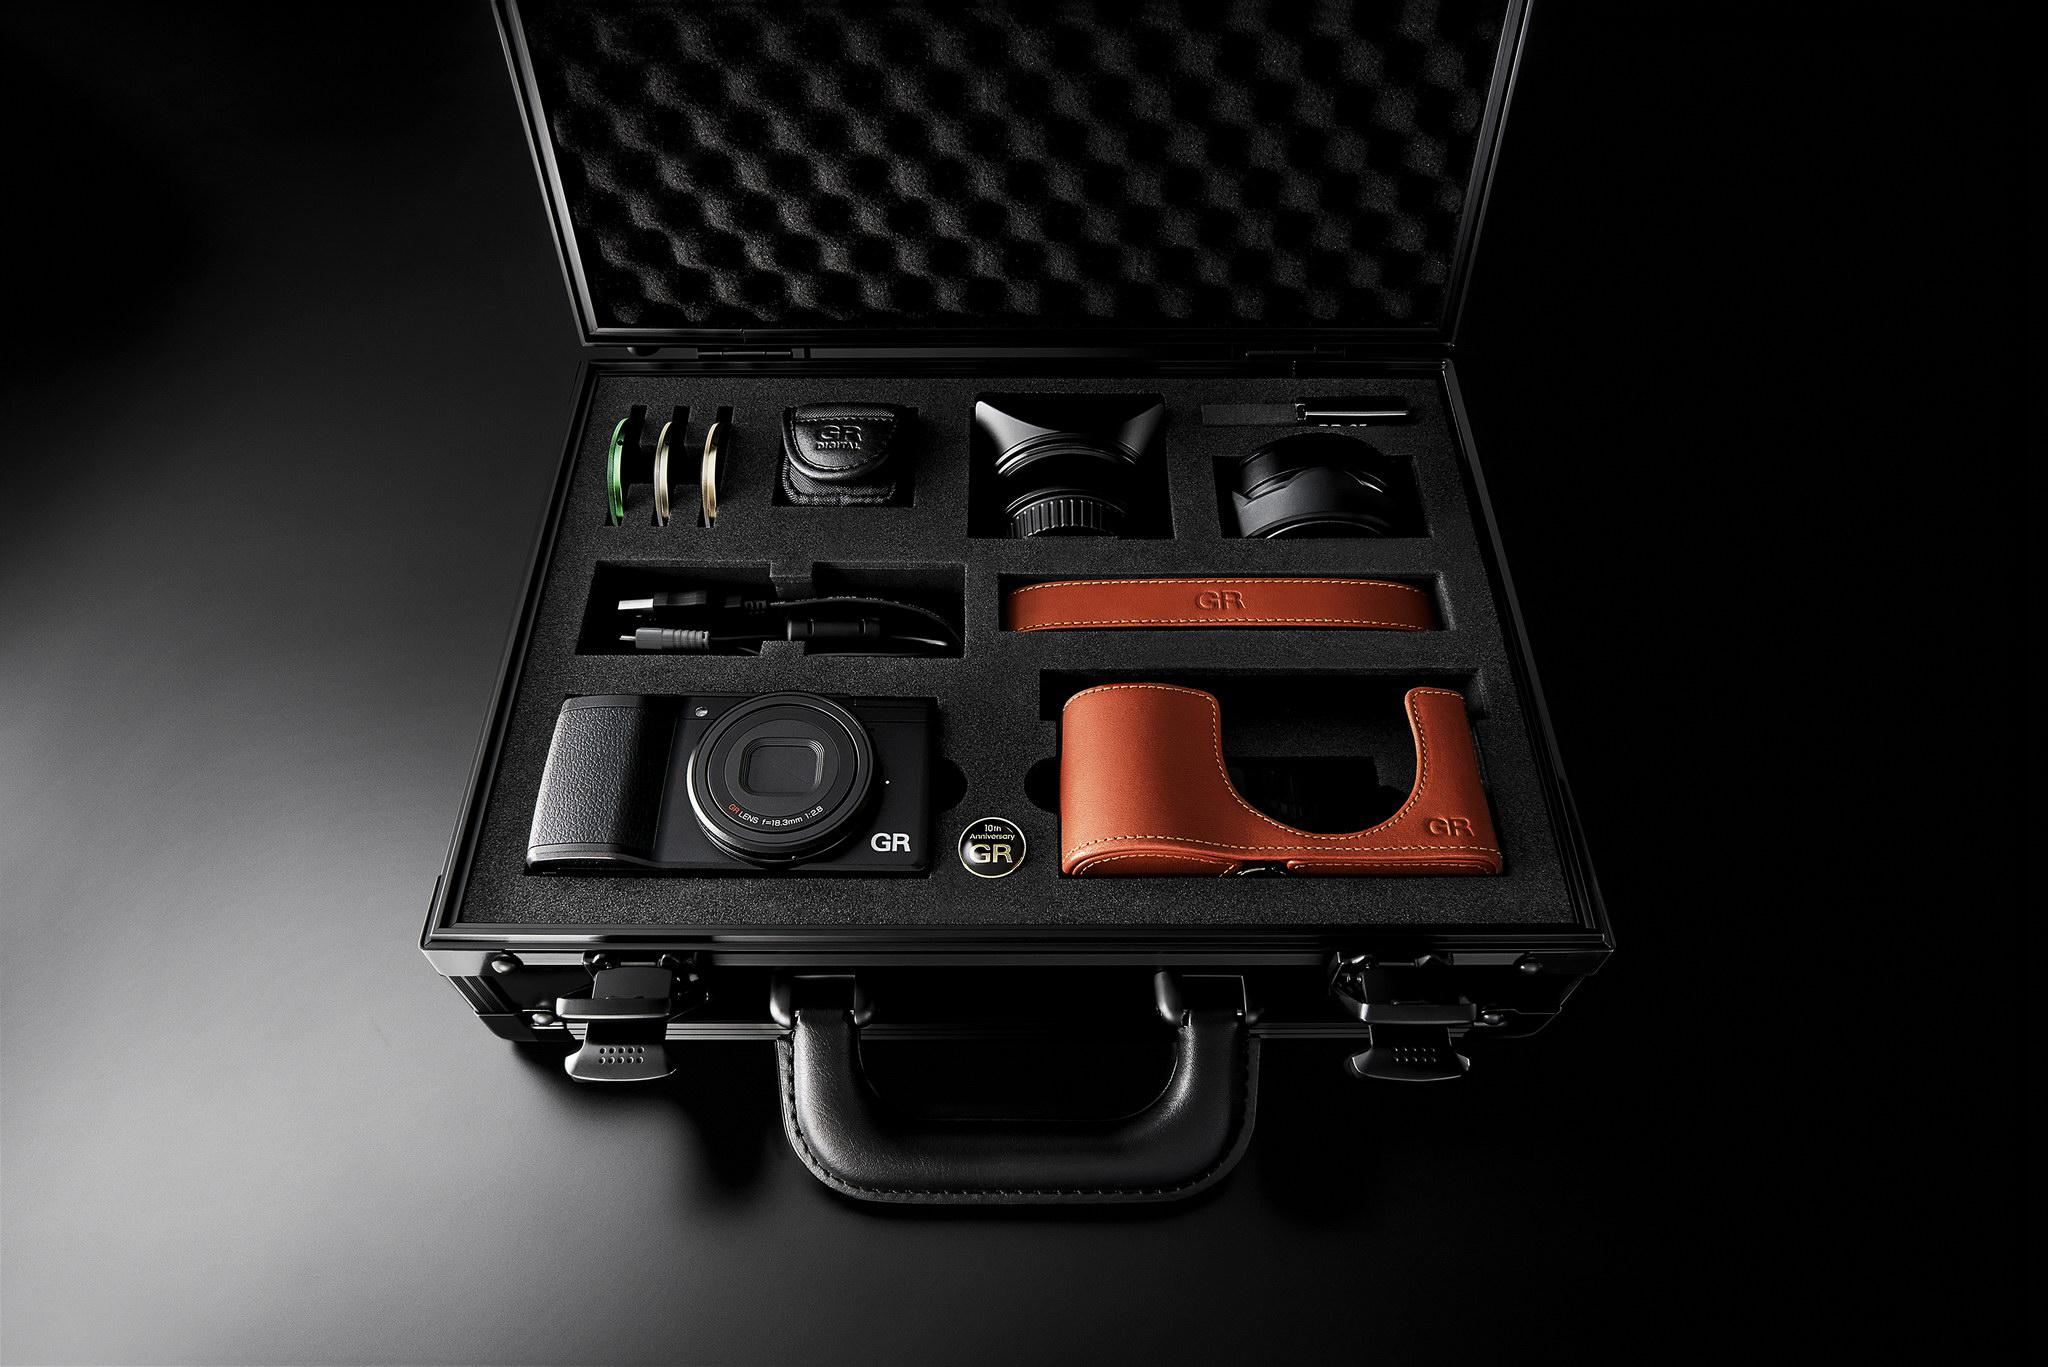 Ricoh GR II Premium Kit 十月尾推出 |金屬感機身包真皮提升豪味